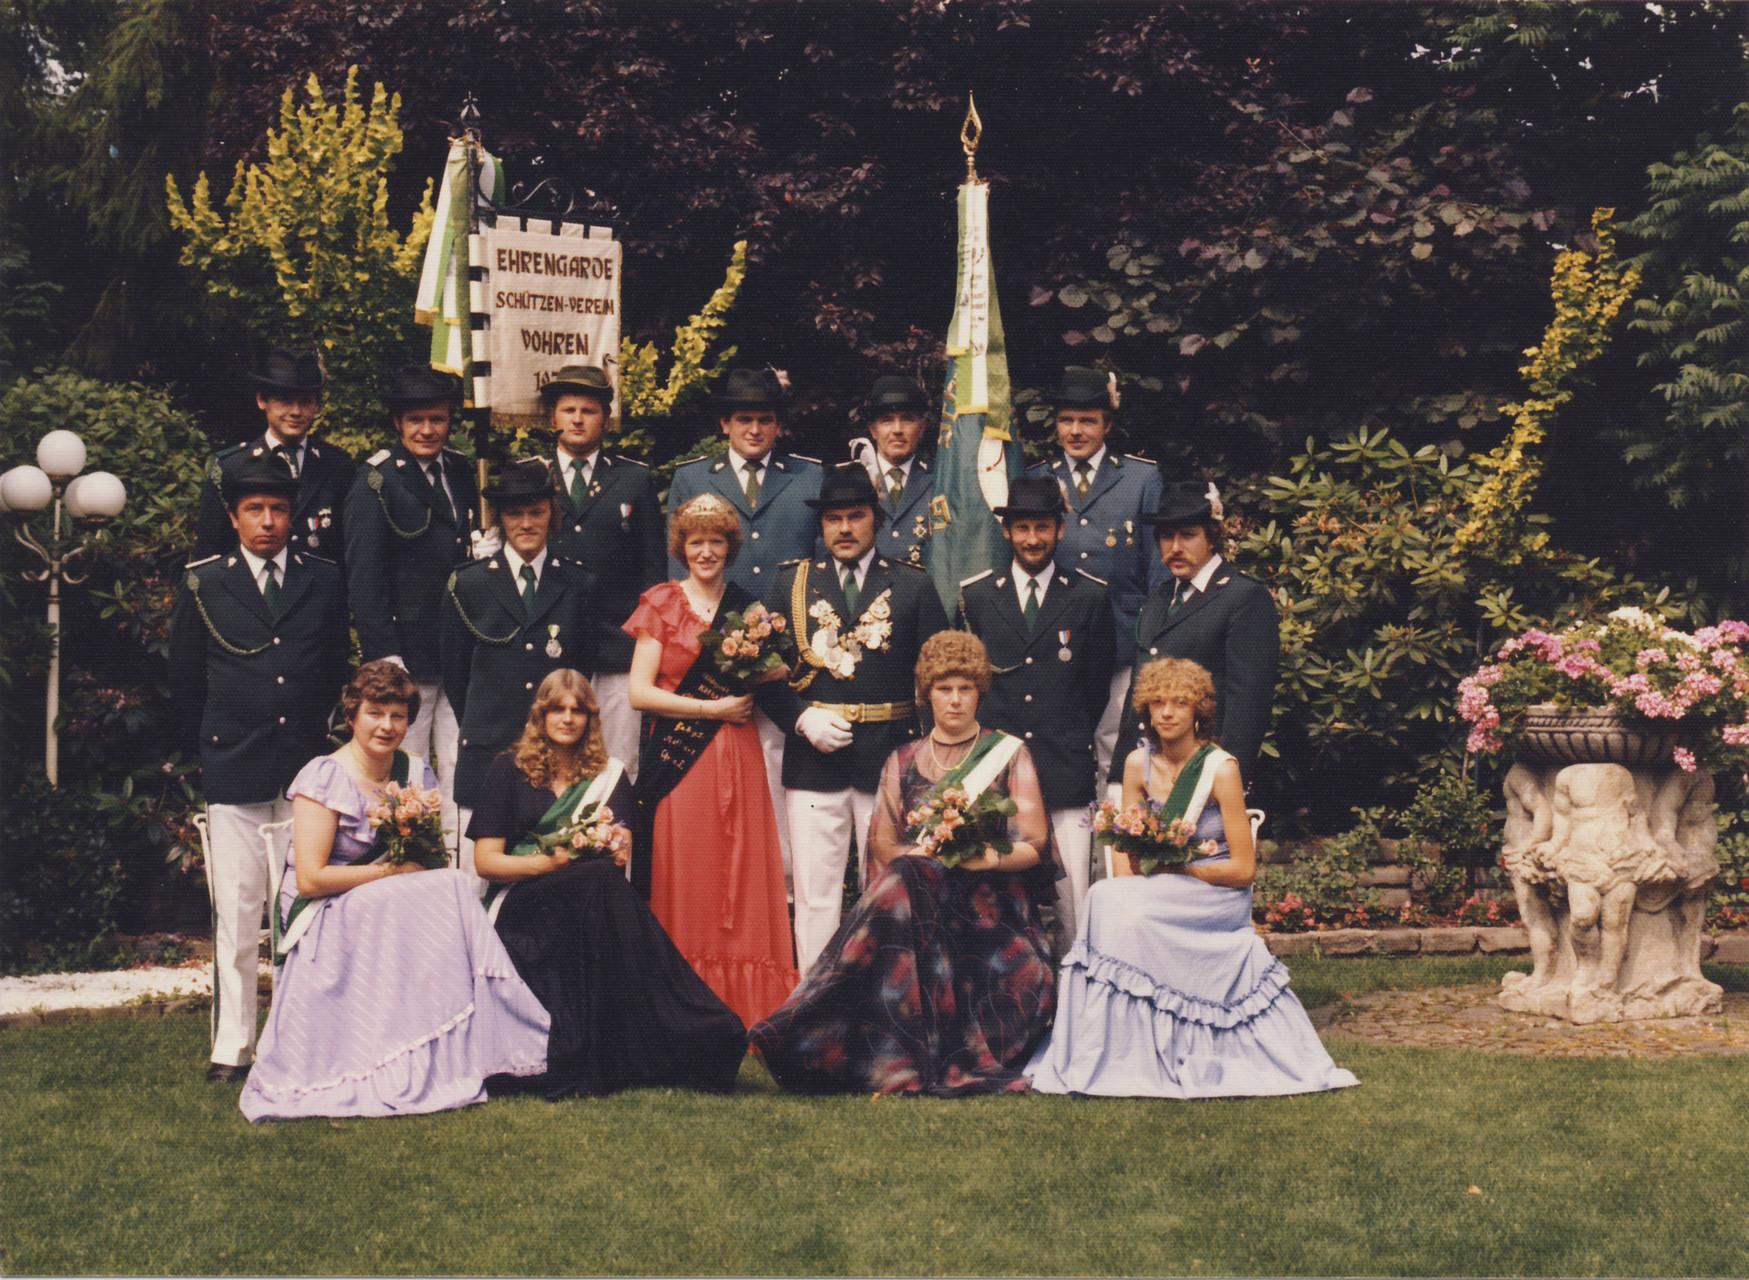 1982: König Theo Jüttner und Königin Christa Jüttner